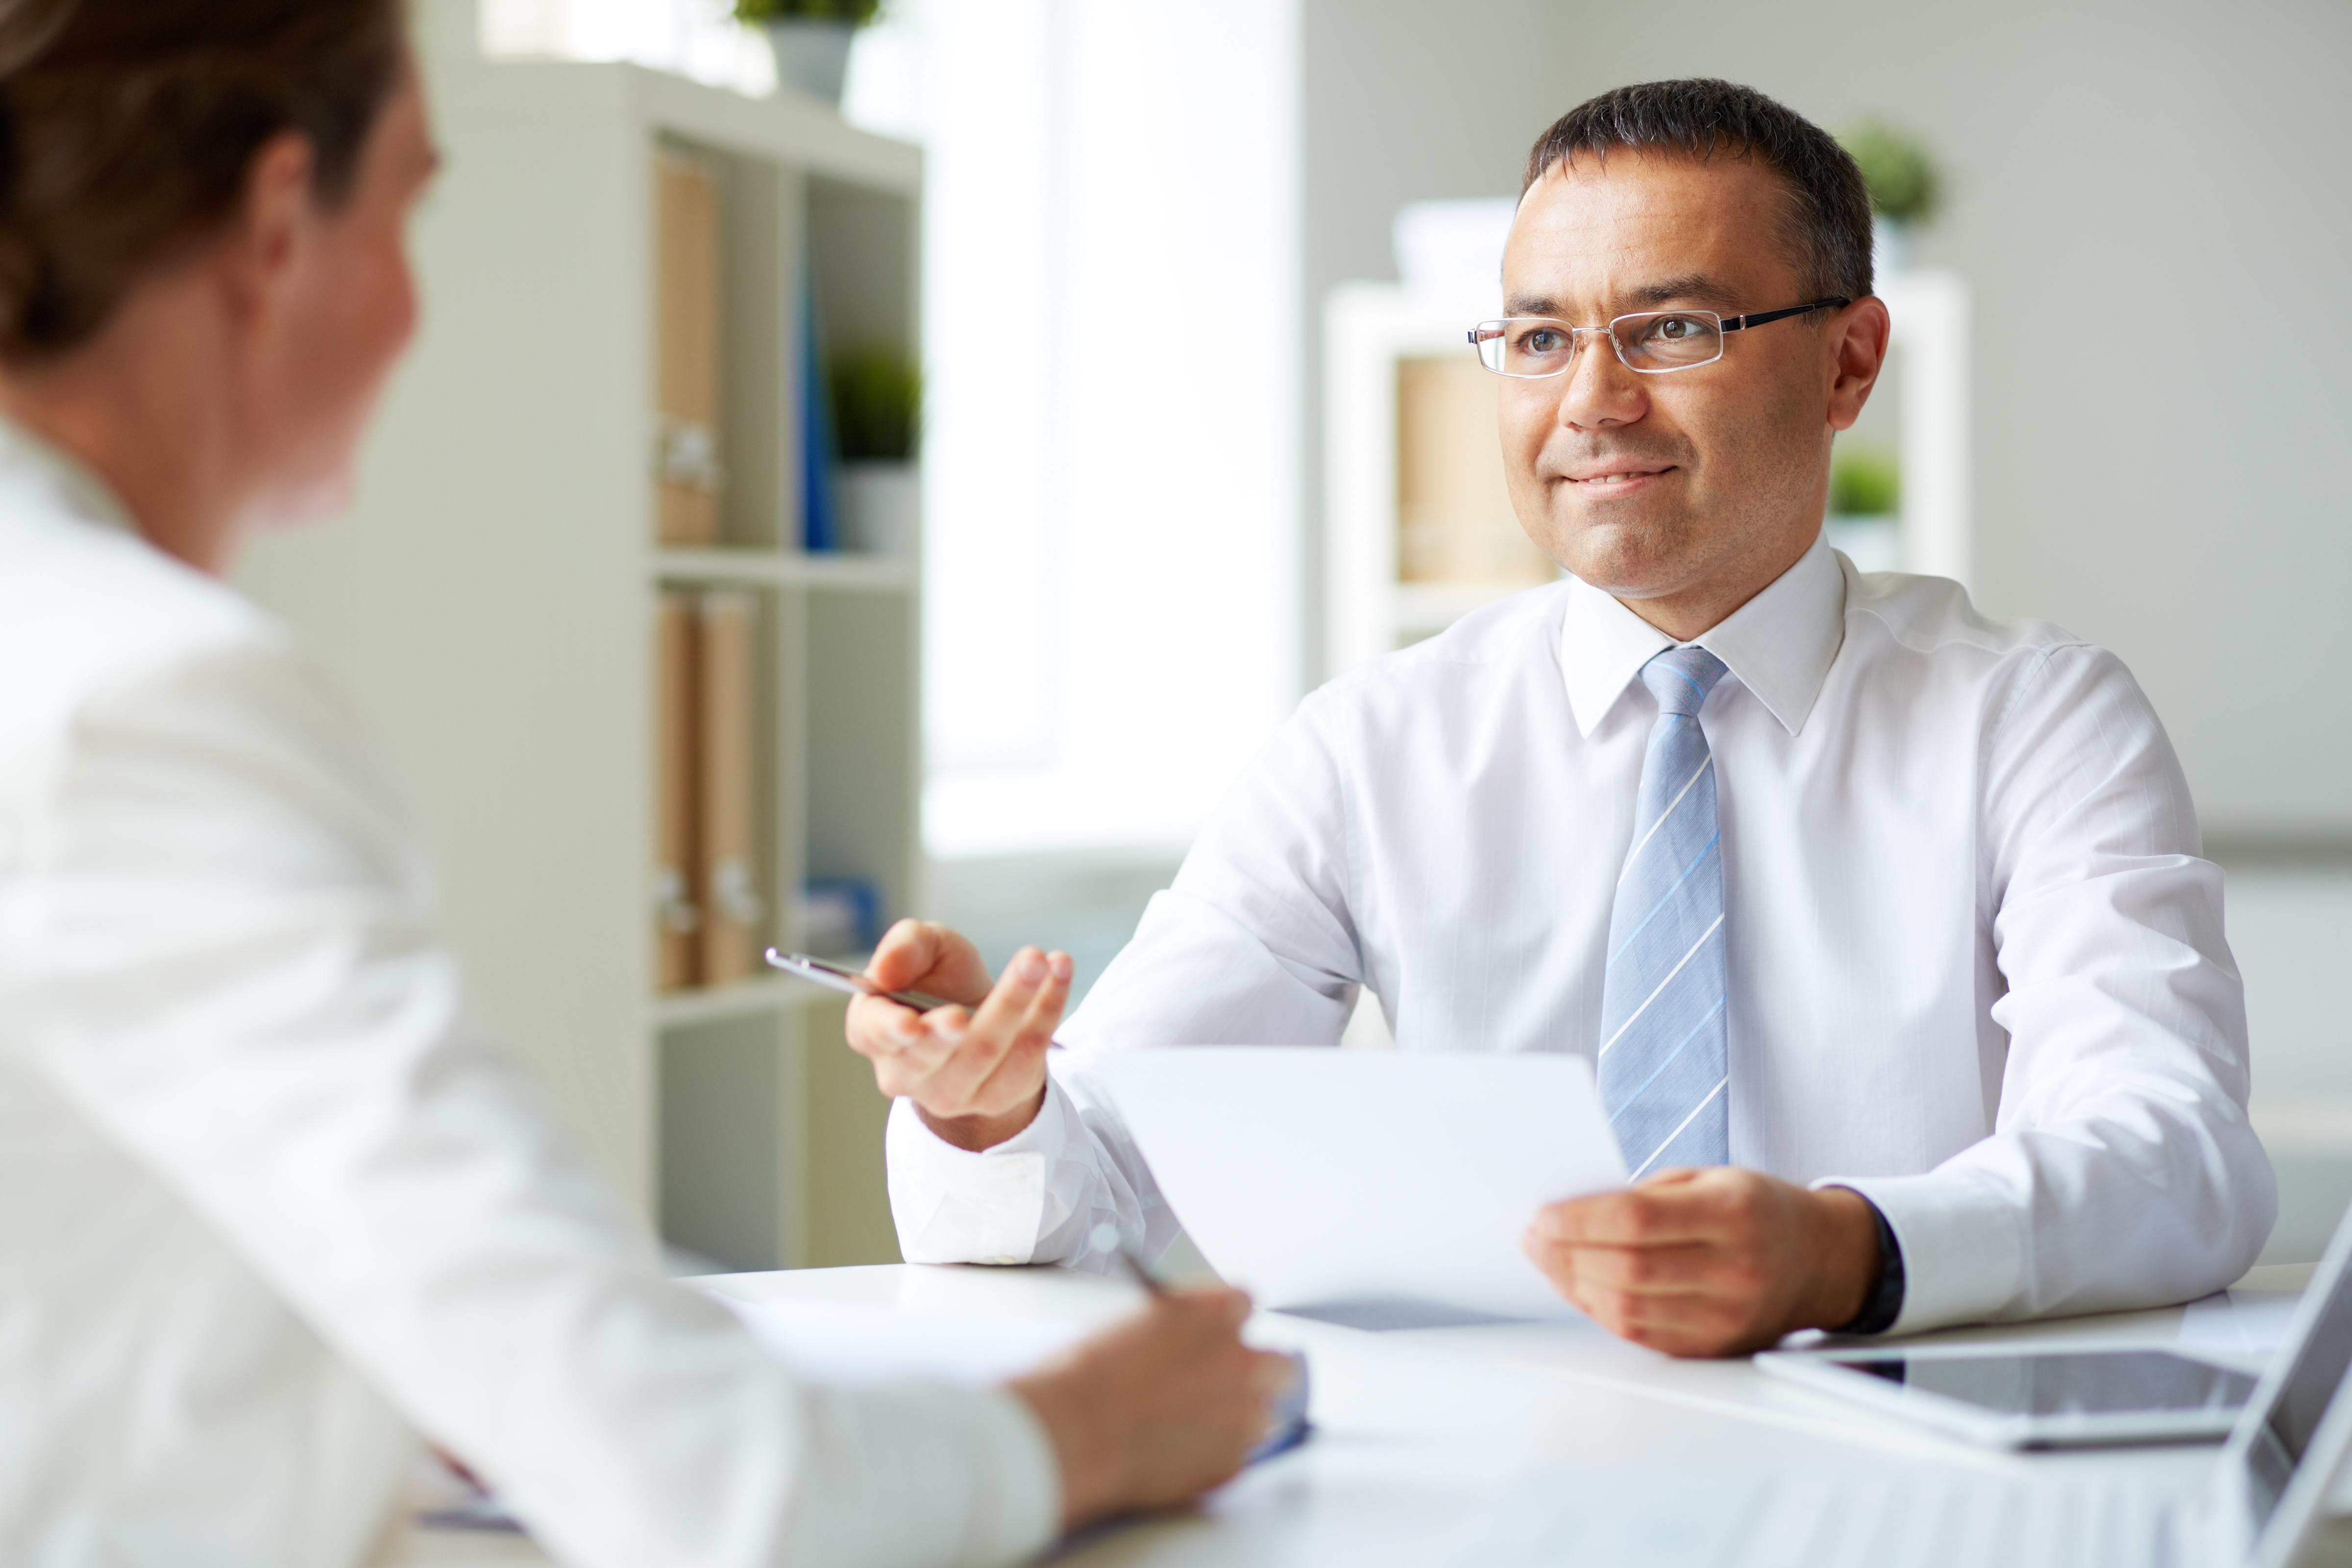 Mature secretary job interview final, sorry